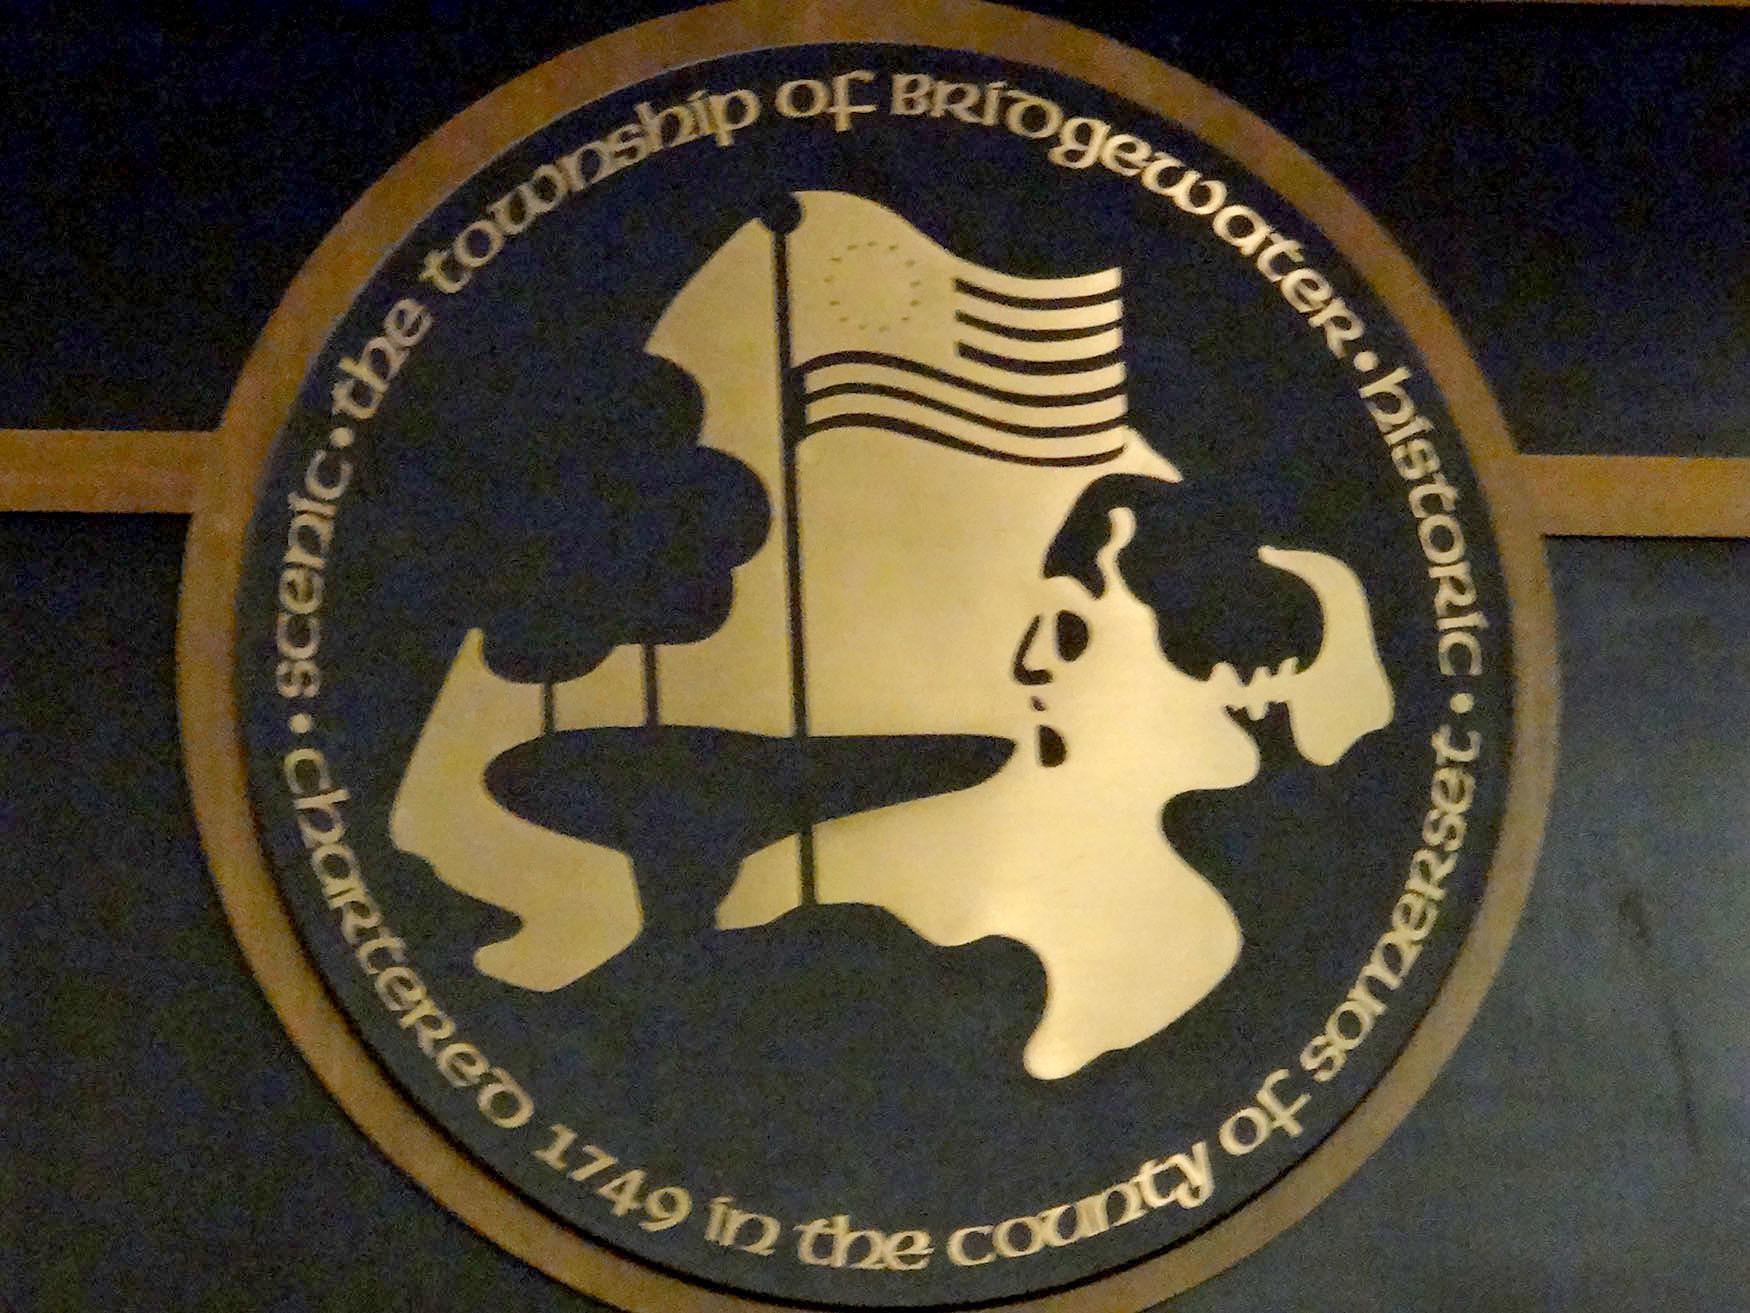 dccfa1b4231bfe5e063c_Bridgewater_symbol.jpg